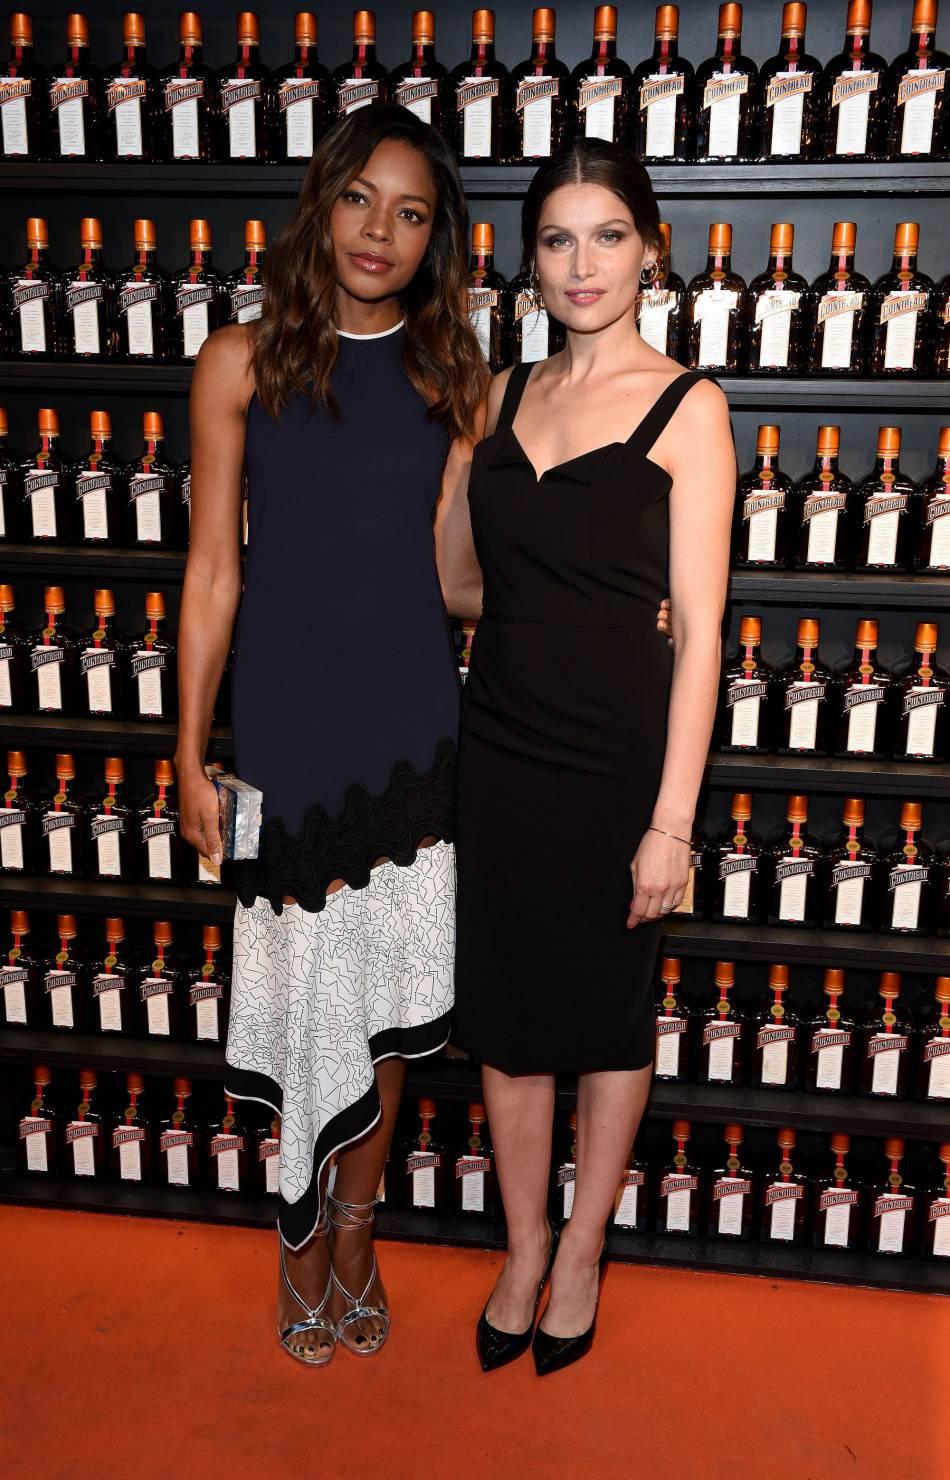 Naomie Harris et Laetitia Casta à la soirée Cointreau Creative Crew Awards à Londres, le 24 mai 2016.